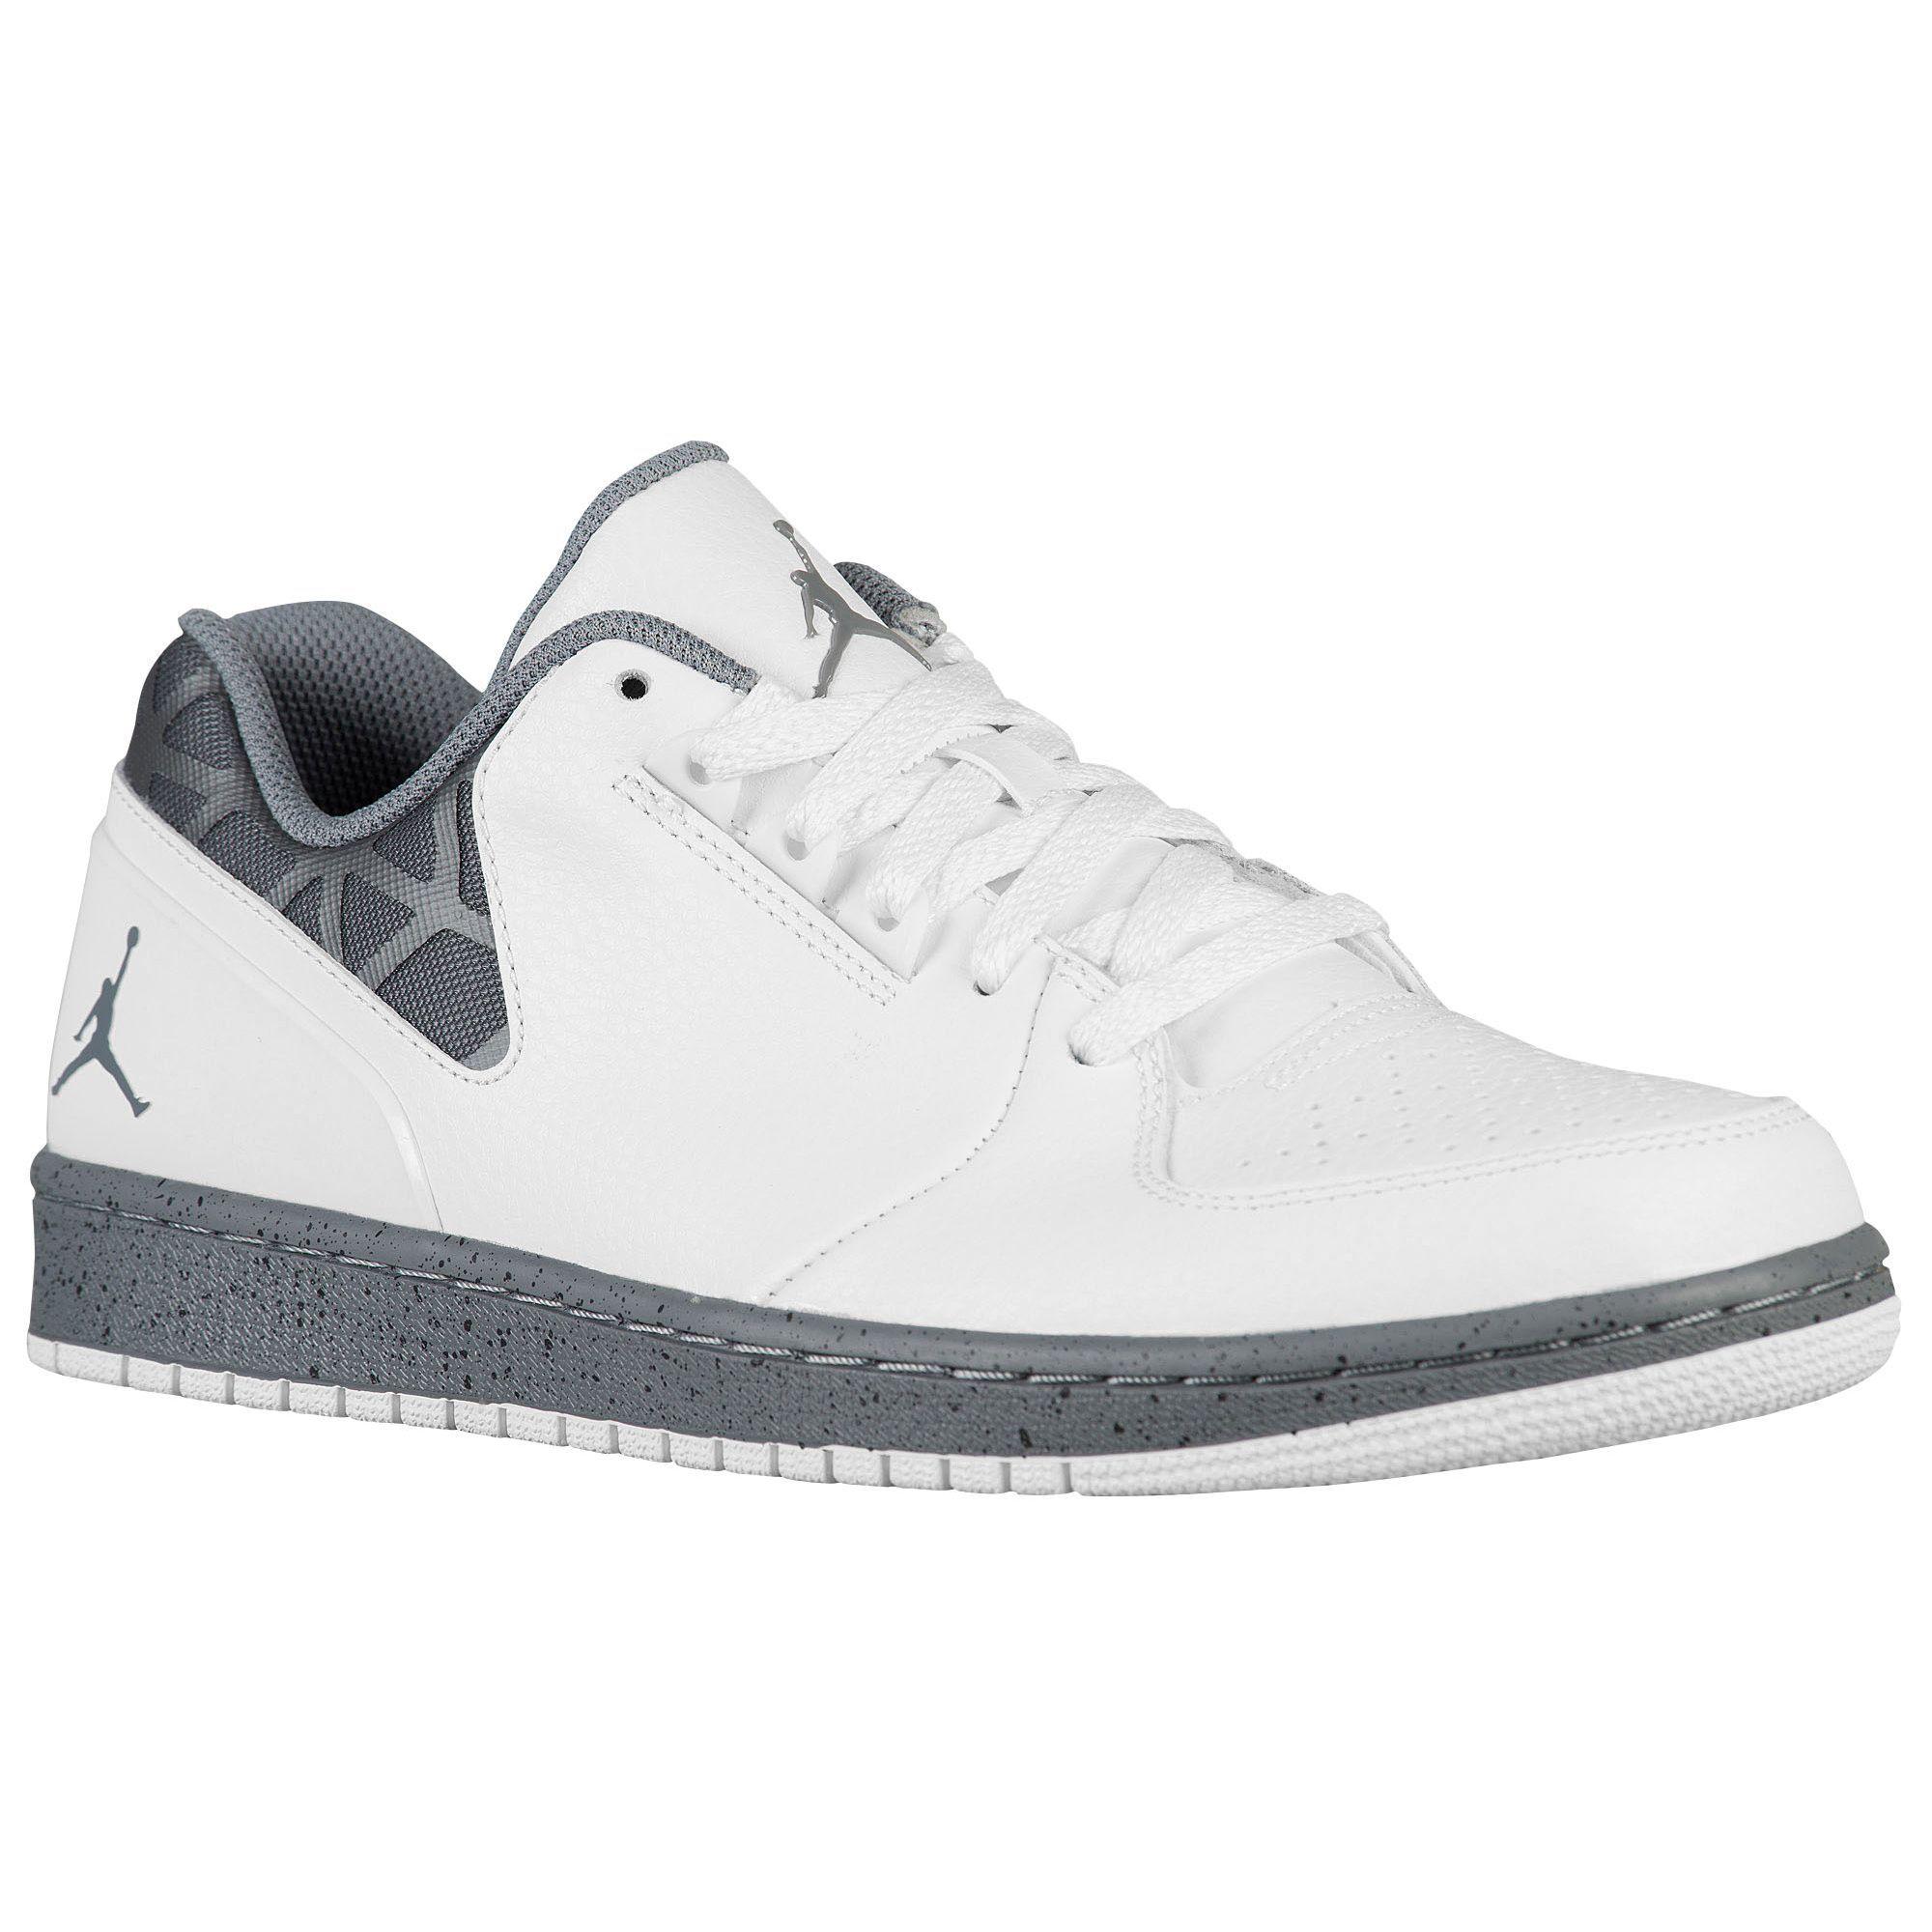 best sneakers bcde0 88f4c Jordan 1 Flight 3 Low - Men s - Basketball - Shoes - White Black Cement  Speckled Midsole